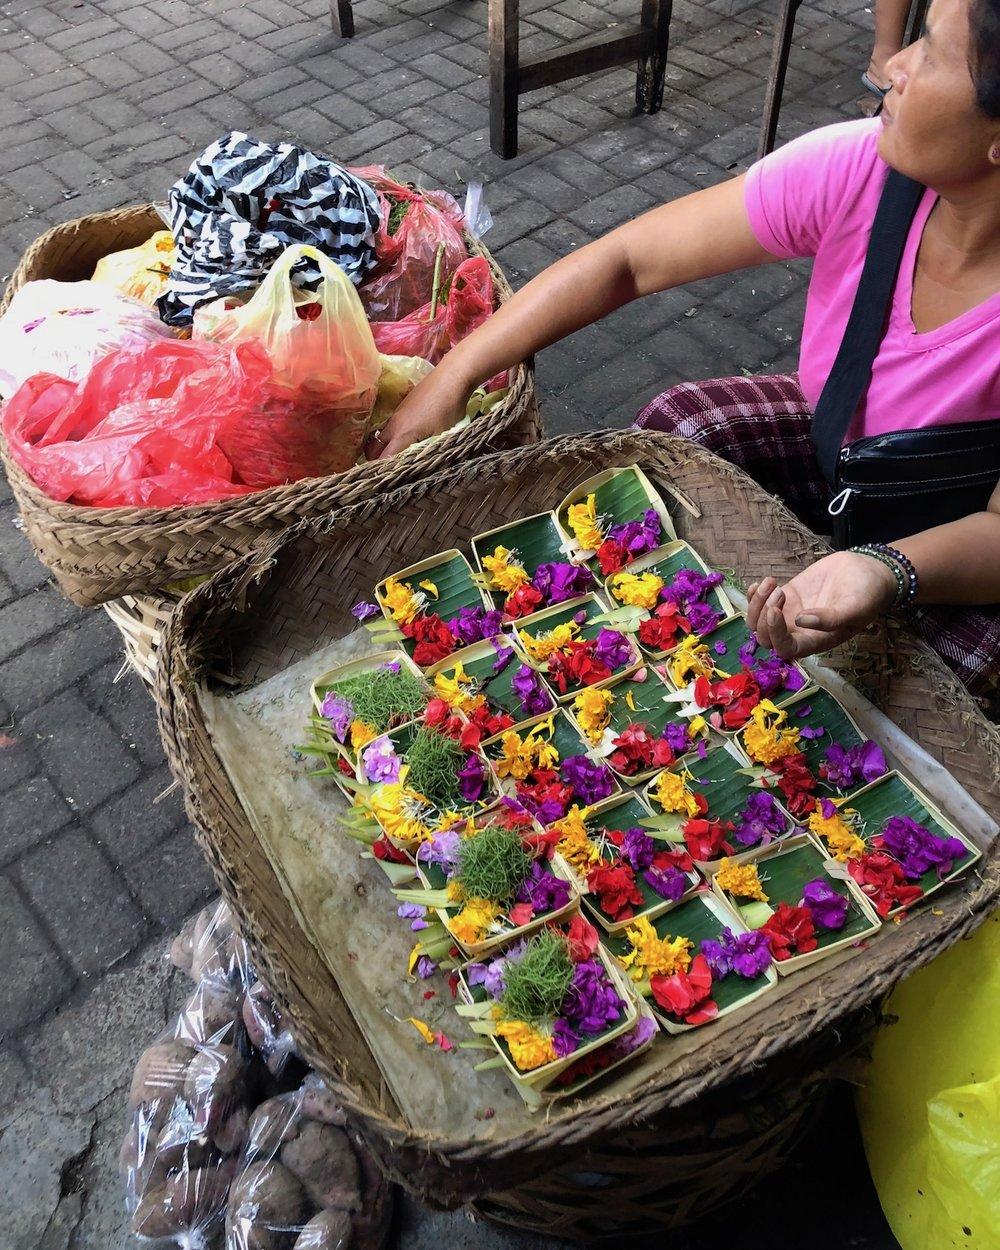 Colorful offerings sold at the Ubud Market, Bali. boldlygotravel.com